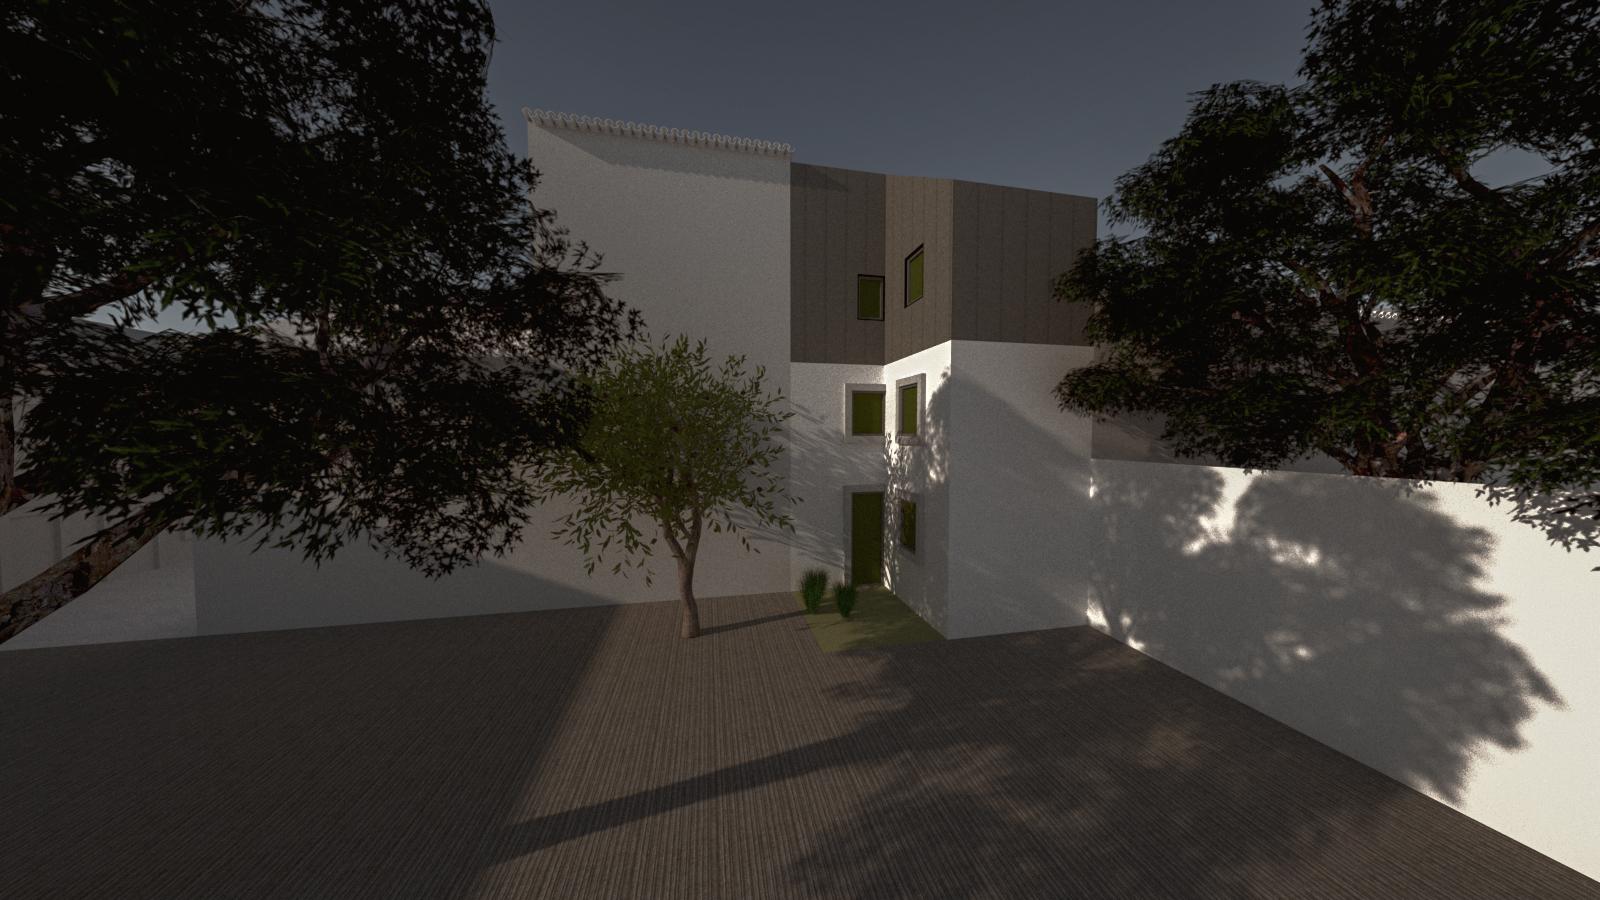 001 Peixinhos - Graça - Lisboa - Paulo Miguez Arquitectos.jpg